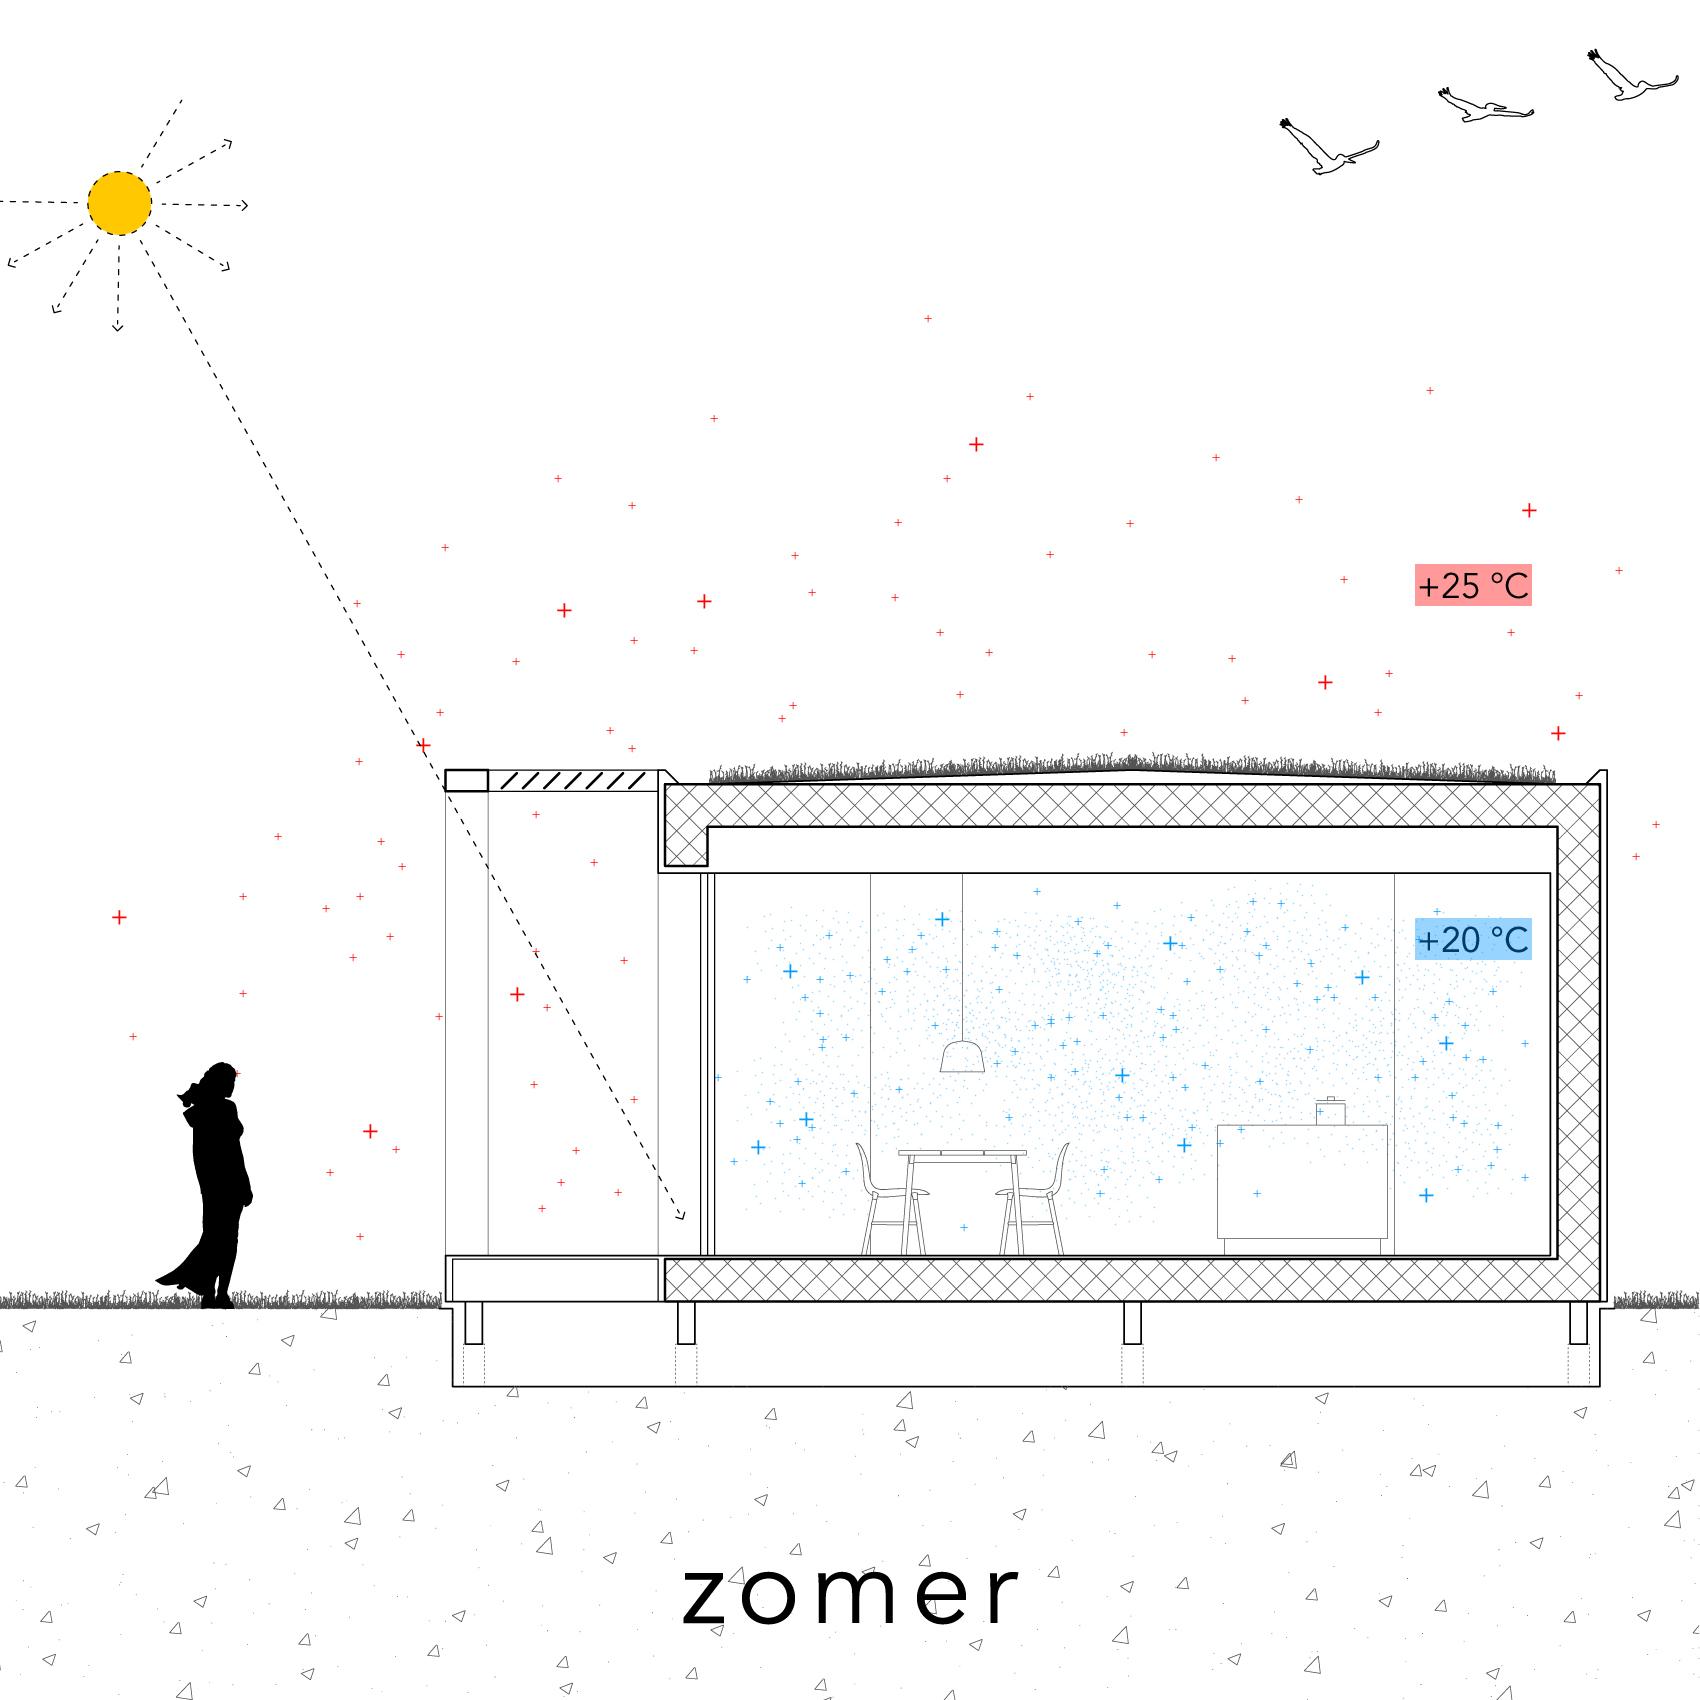 Modle - Zon - zomer